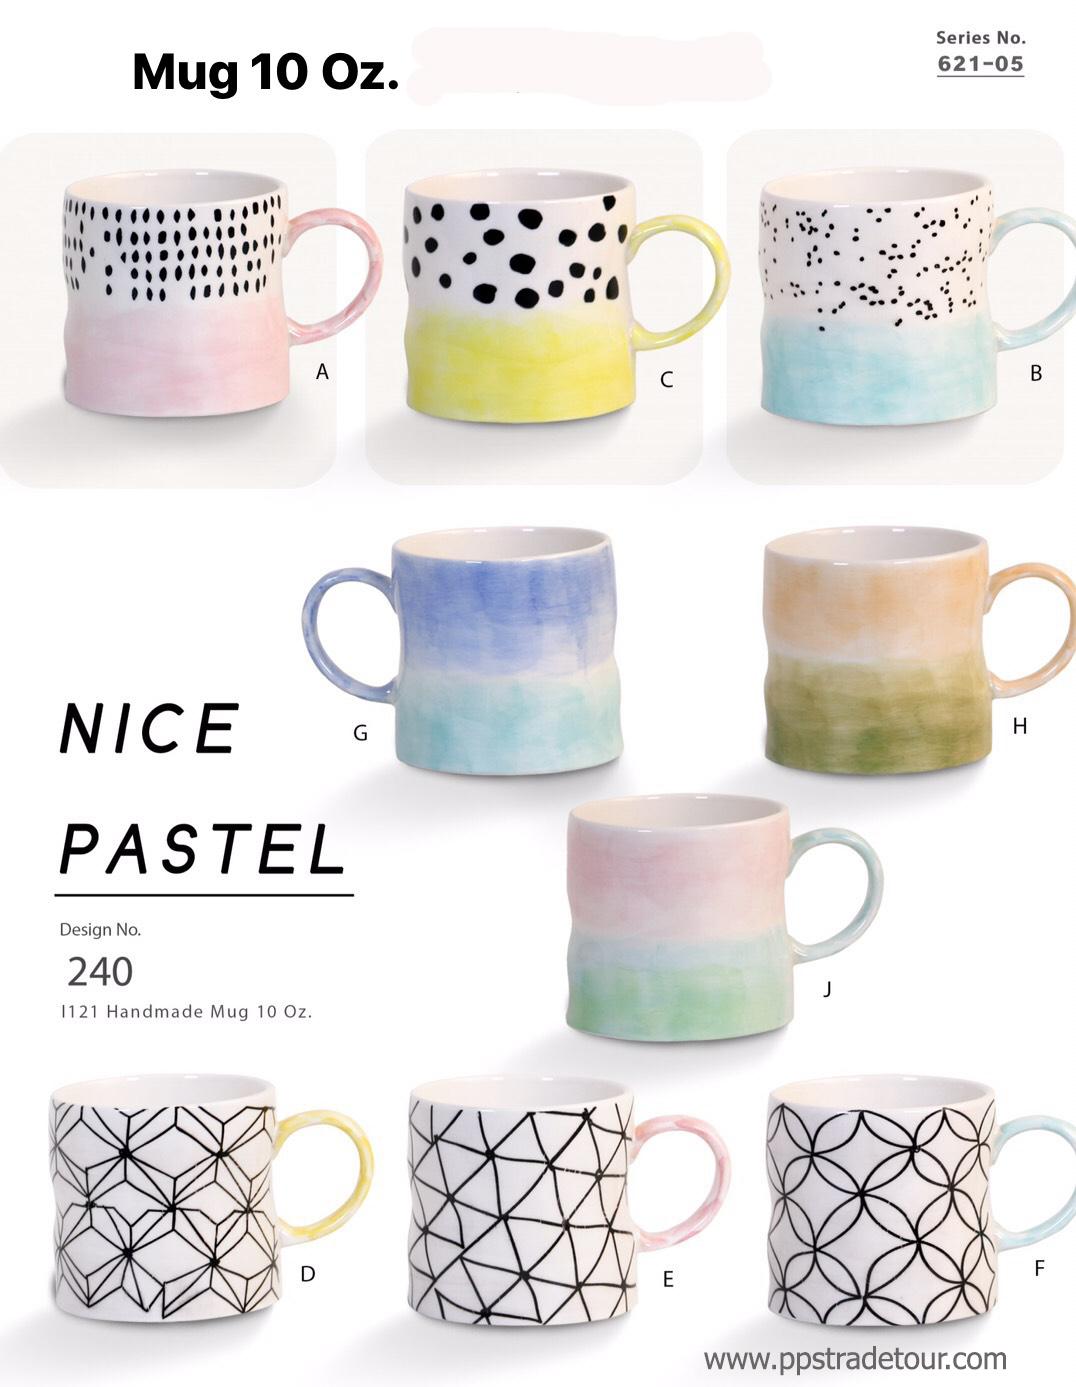 Nice Pastel-Ceramic Mug 10oz.